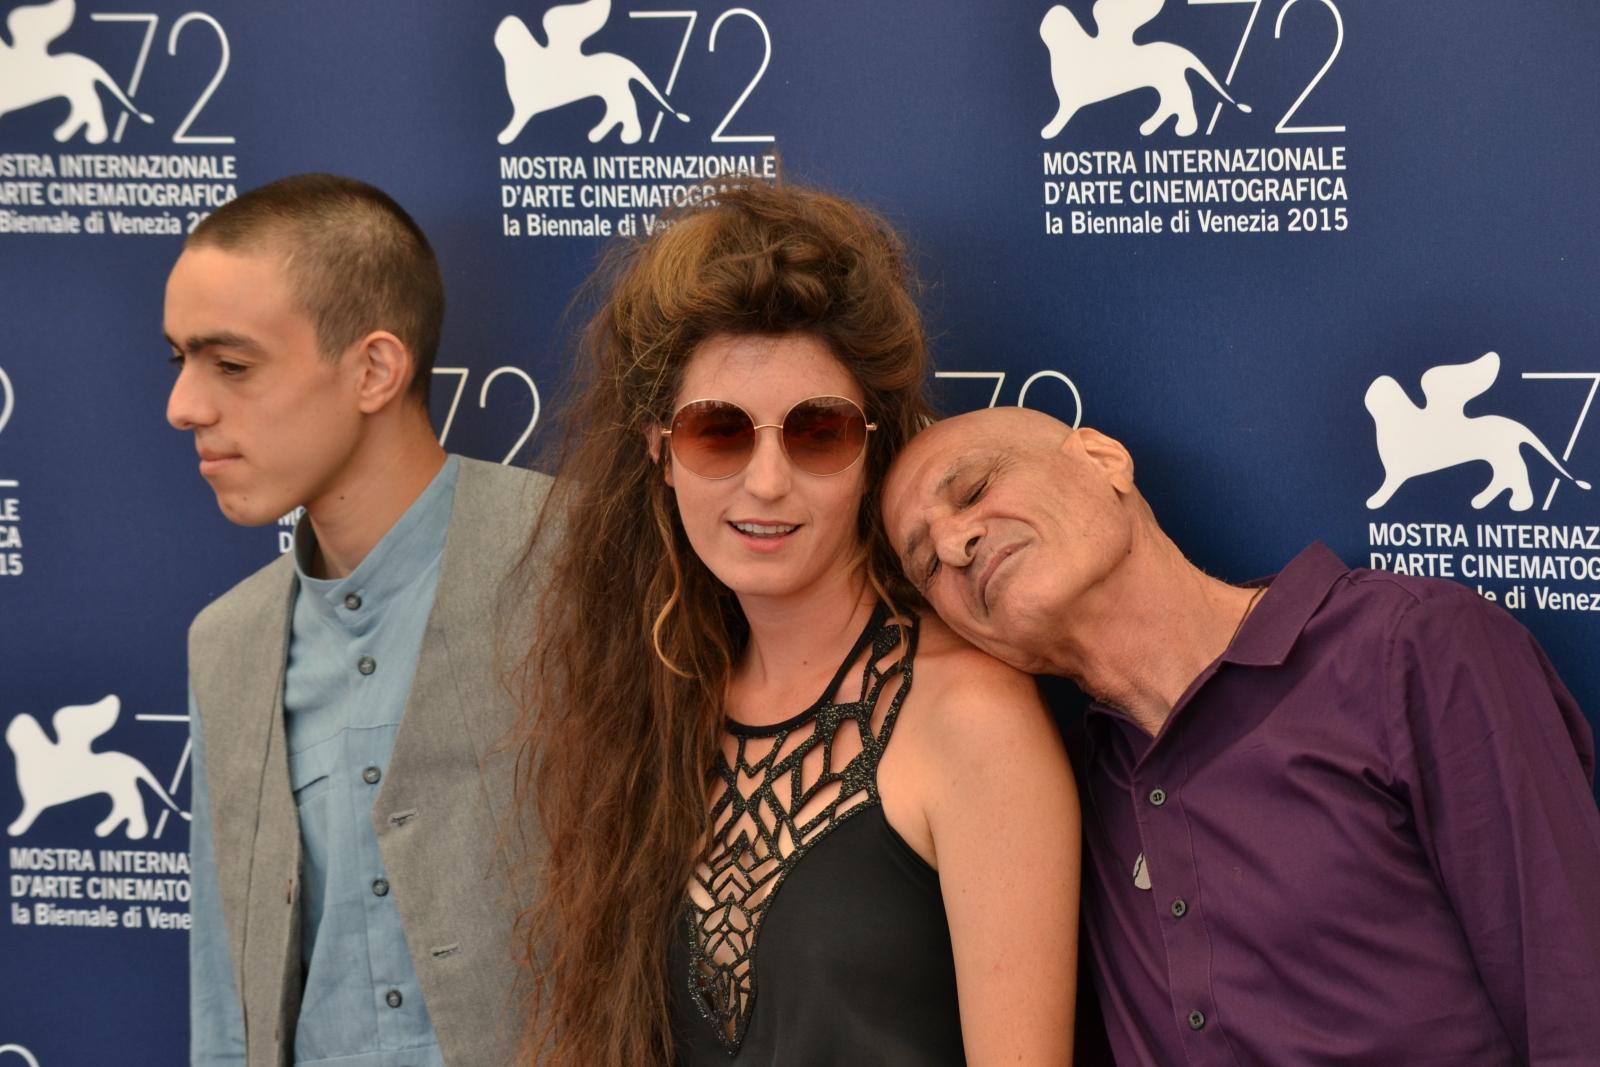 Venezia 2015: Hadar Morag, Muhammad Da'as, Yuval Gurevich al photocall di Lama Azavtani (Why Hast Thou Forsaken Me)